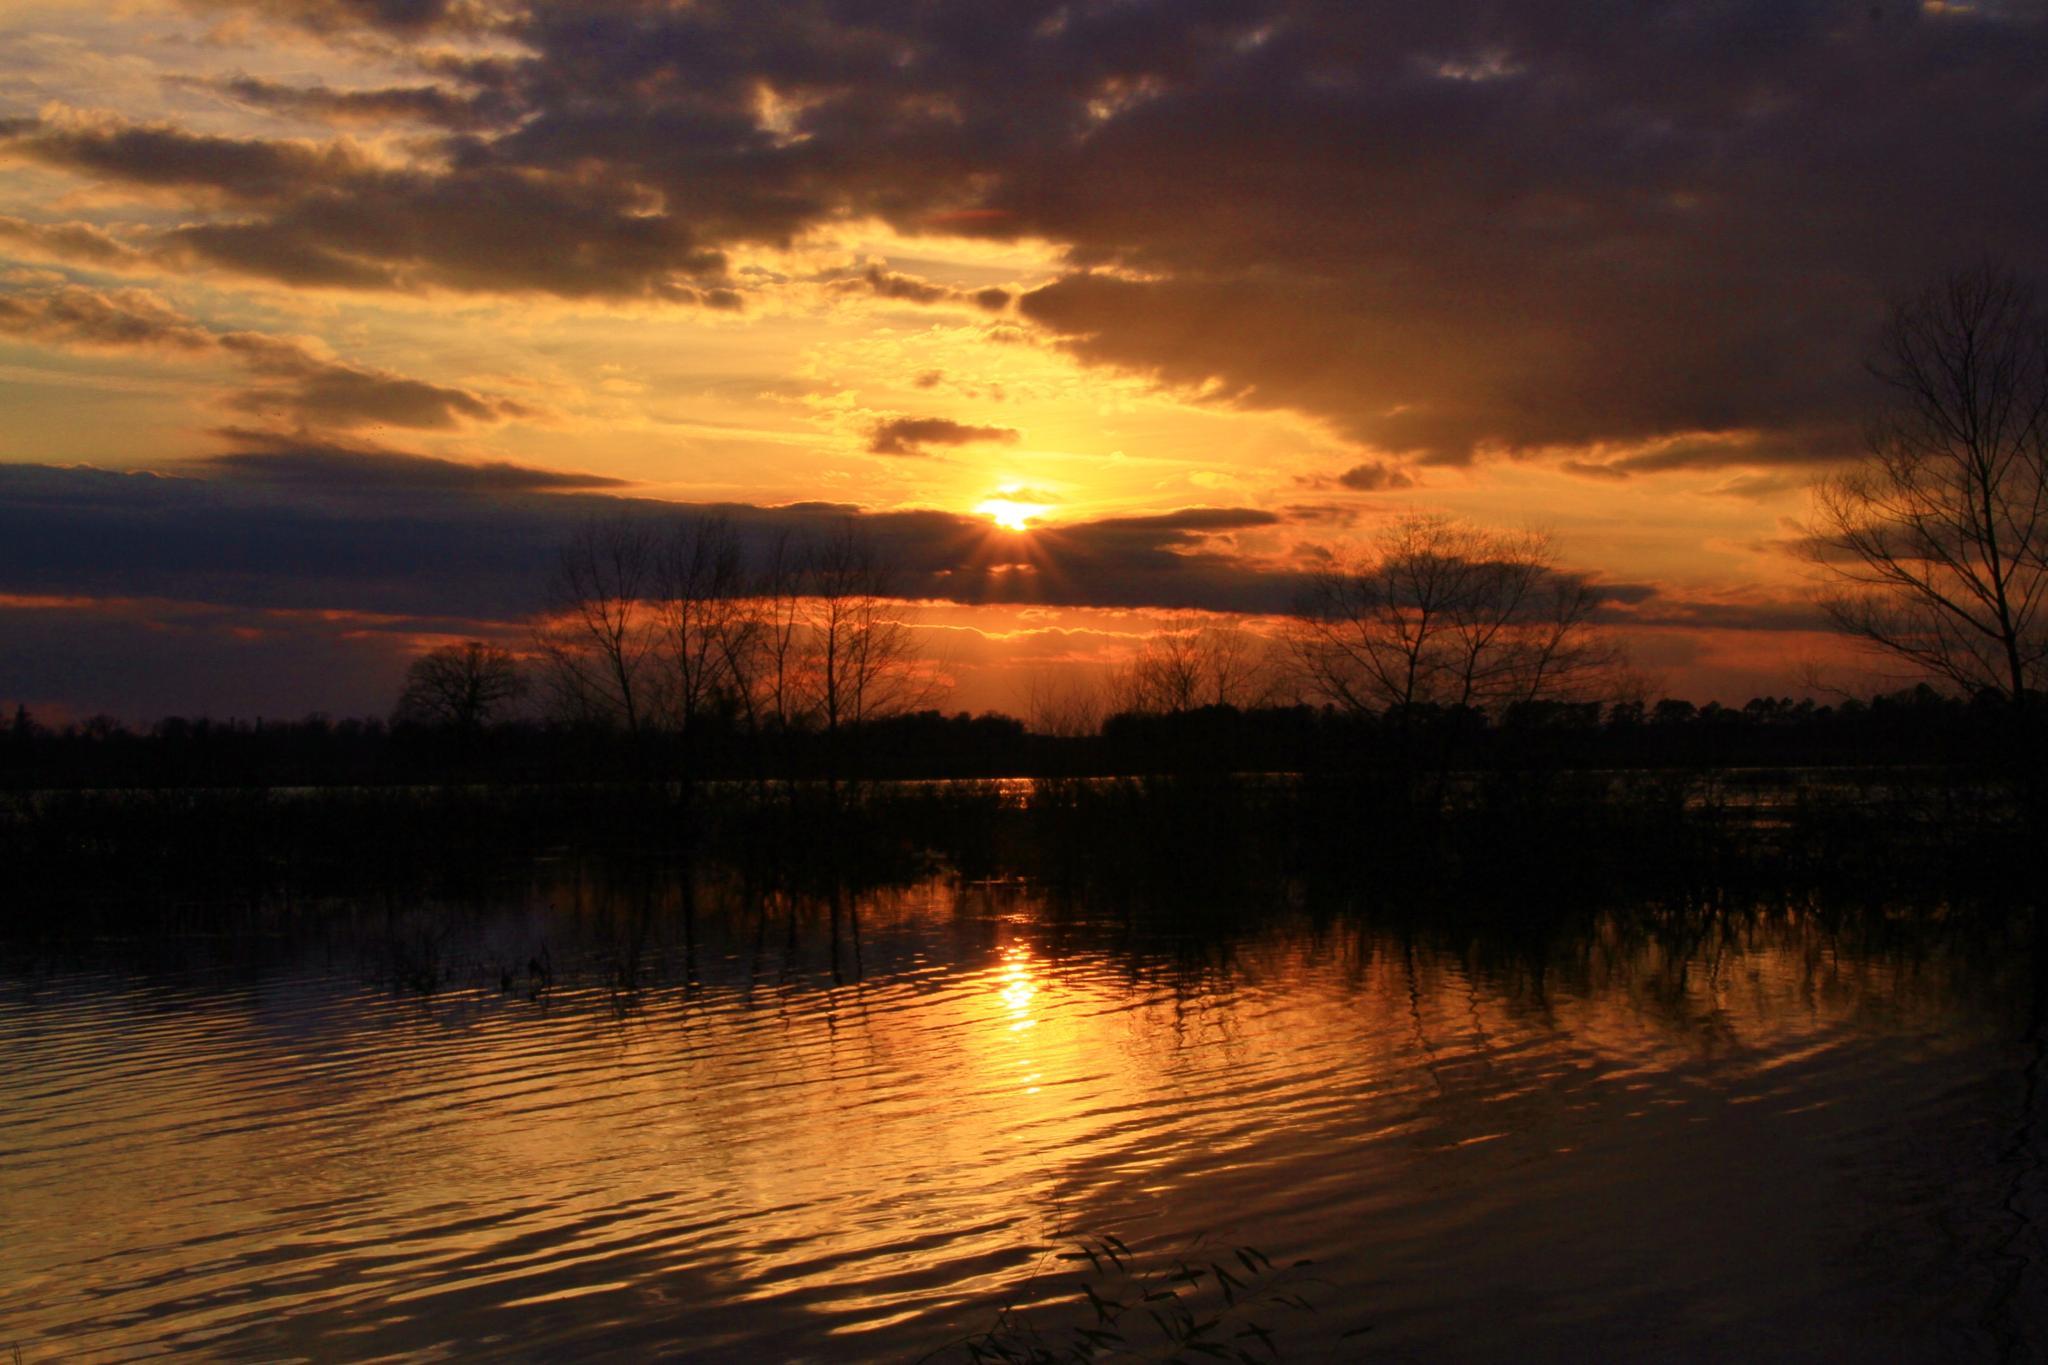 Sunset at Swan Creek by Jim Nash